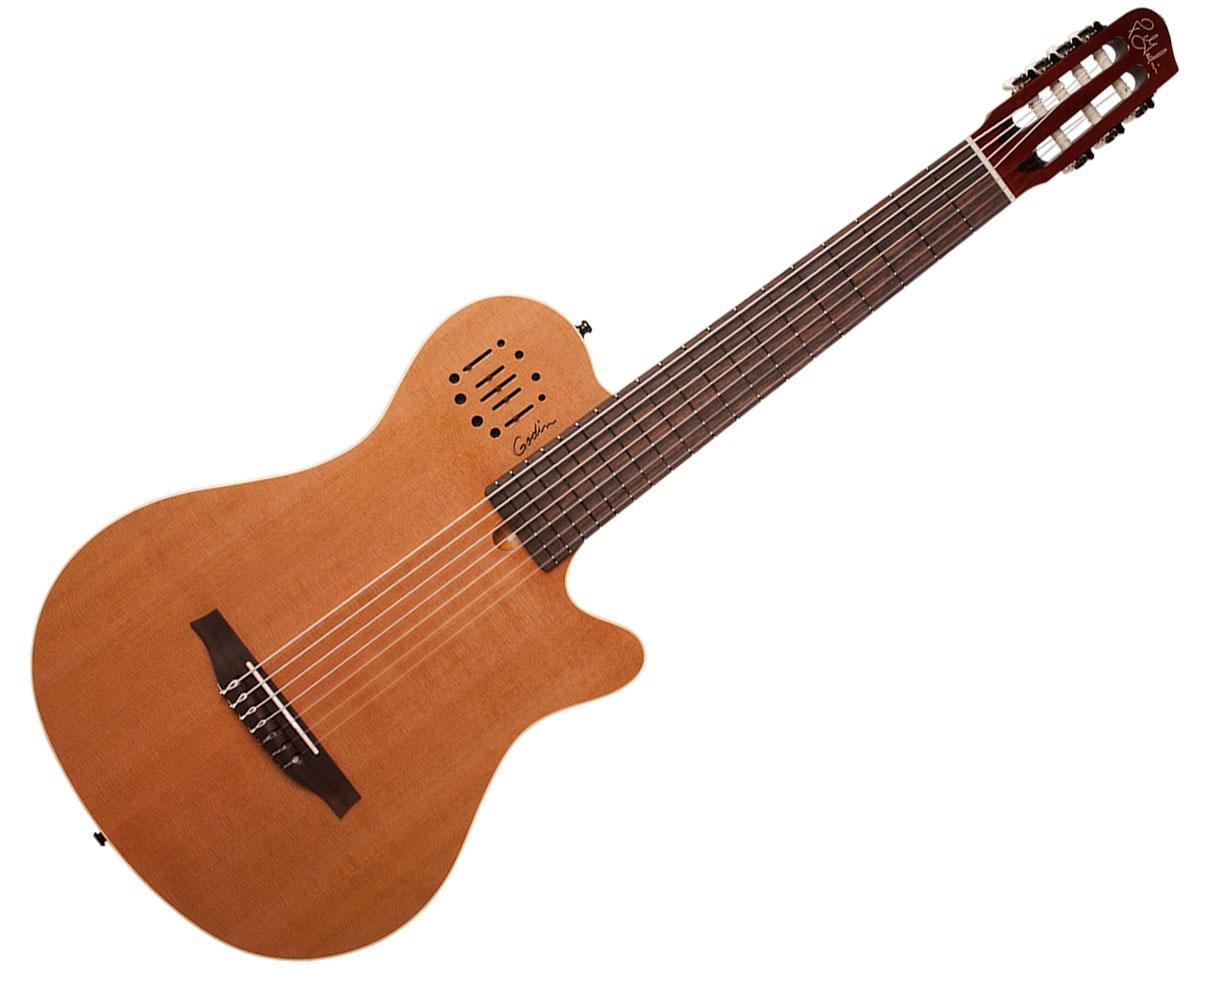 godin multiac nylon encore 7 string electric guitar natural used ebay. Black Bedroom Furniture Sets. Home Design Ideas